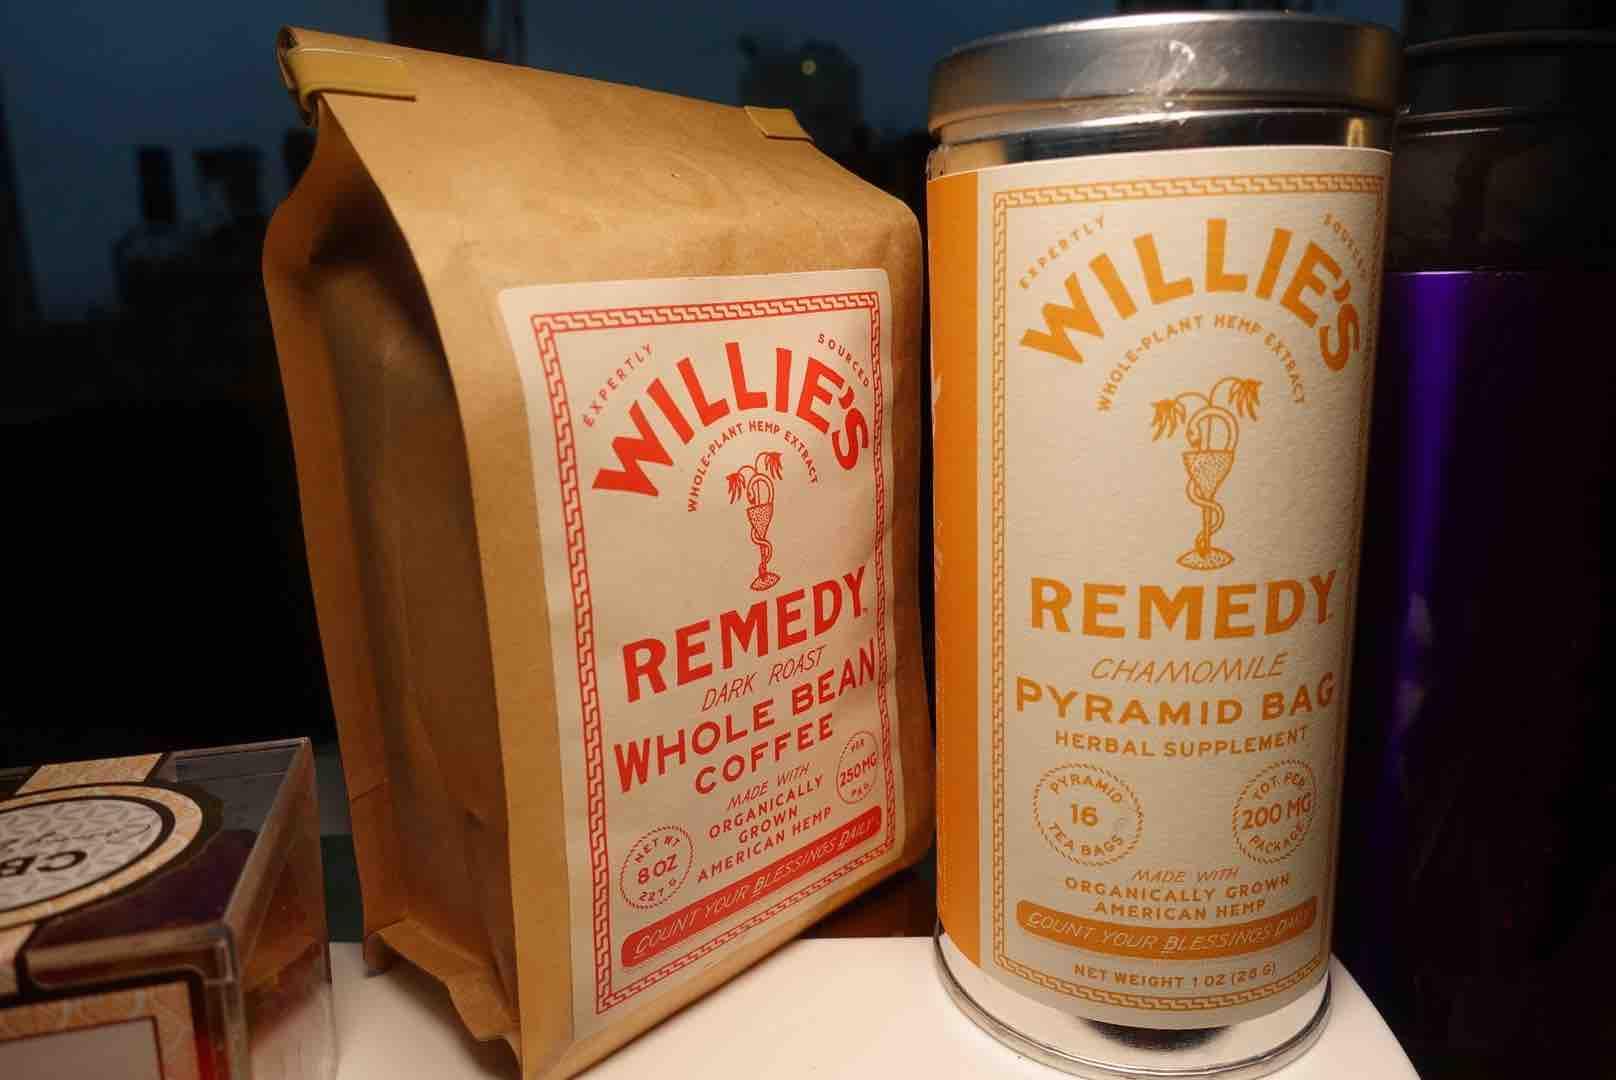 Willie's Remedy CBD Coffee & Tea Gift